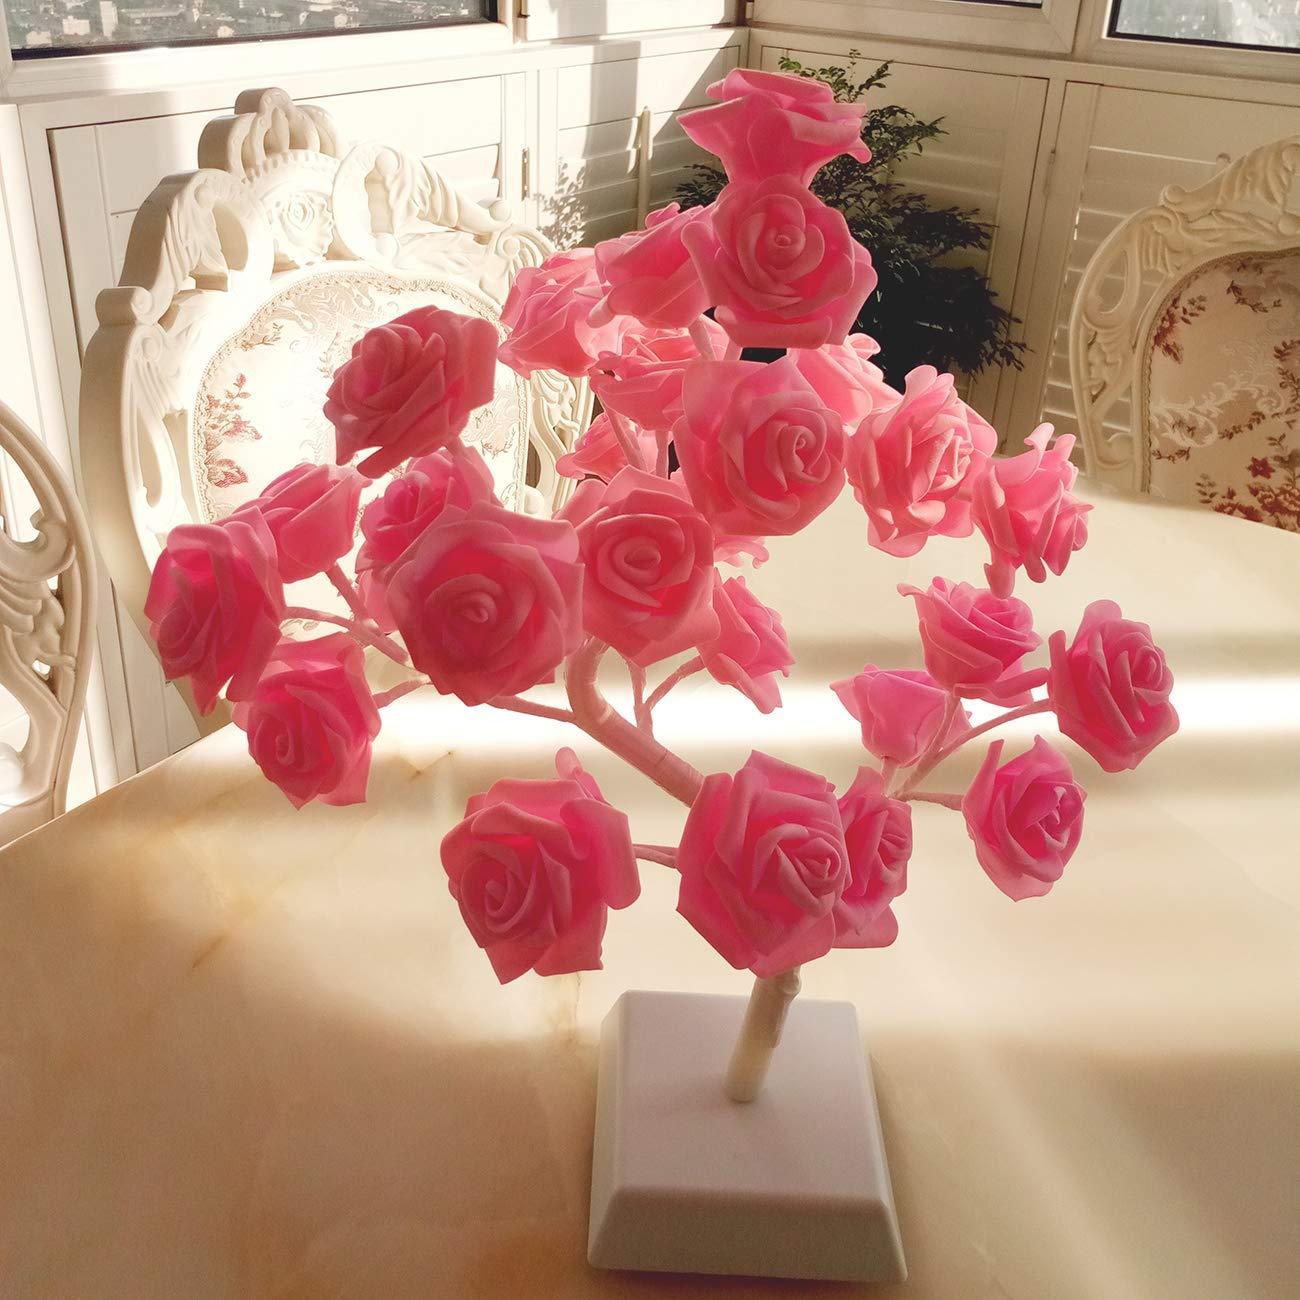 Bolylight Rose Flower Lamp Night Light Centerpiece Table Lamp 1771